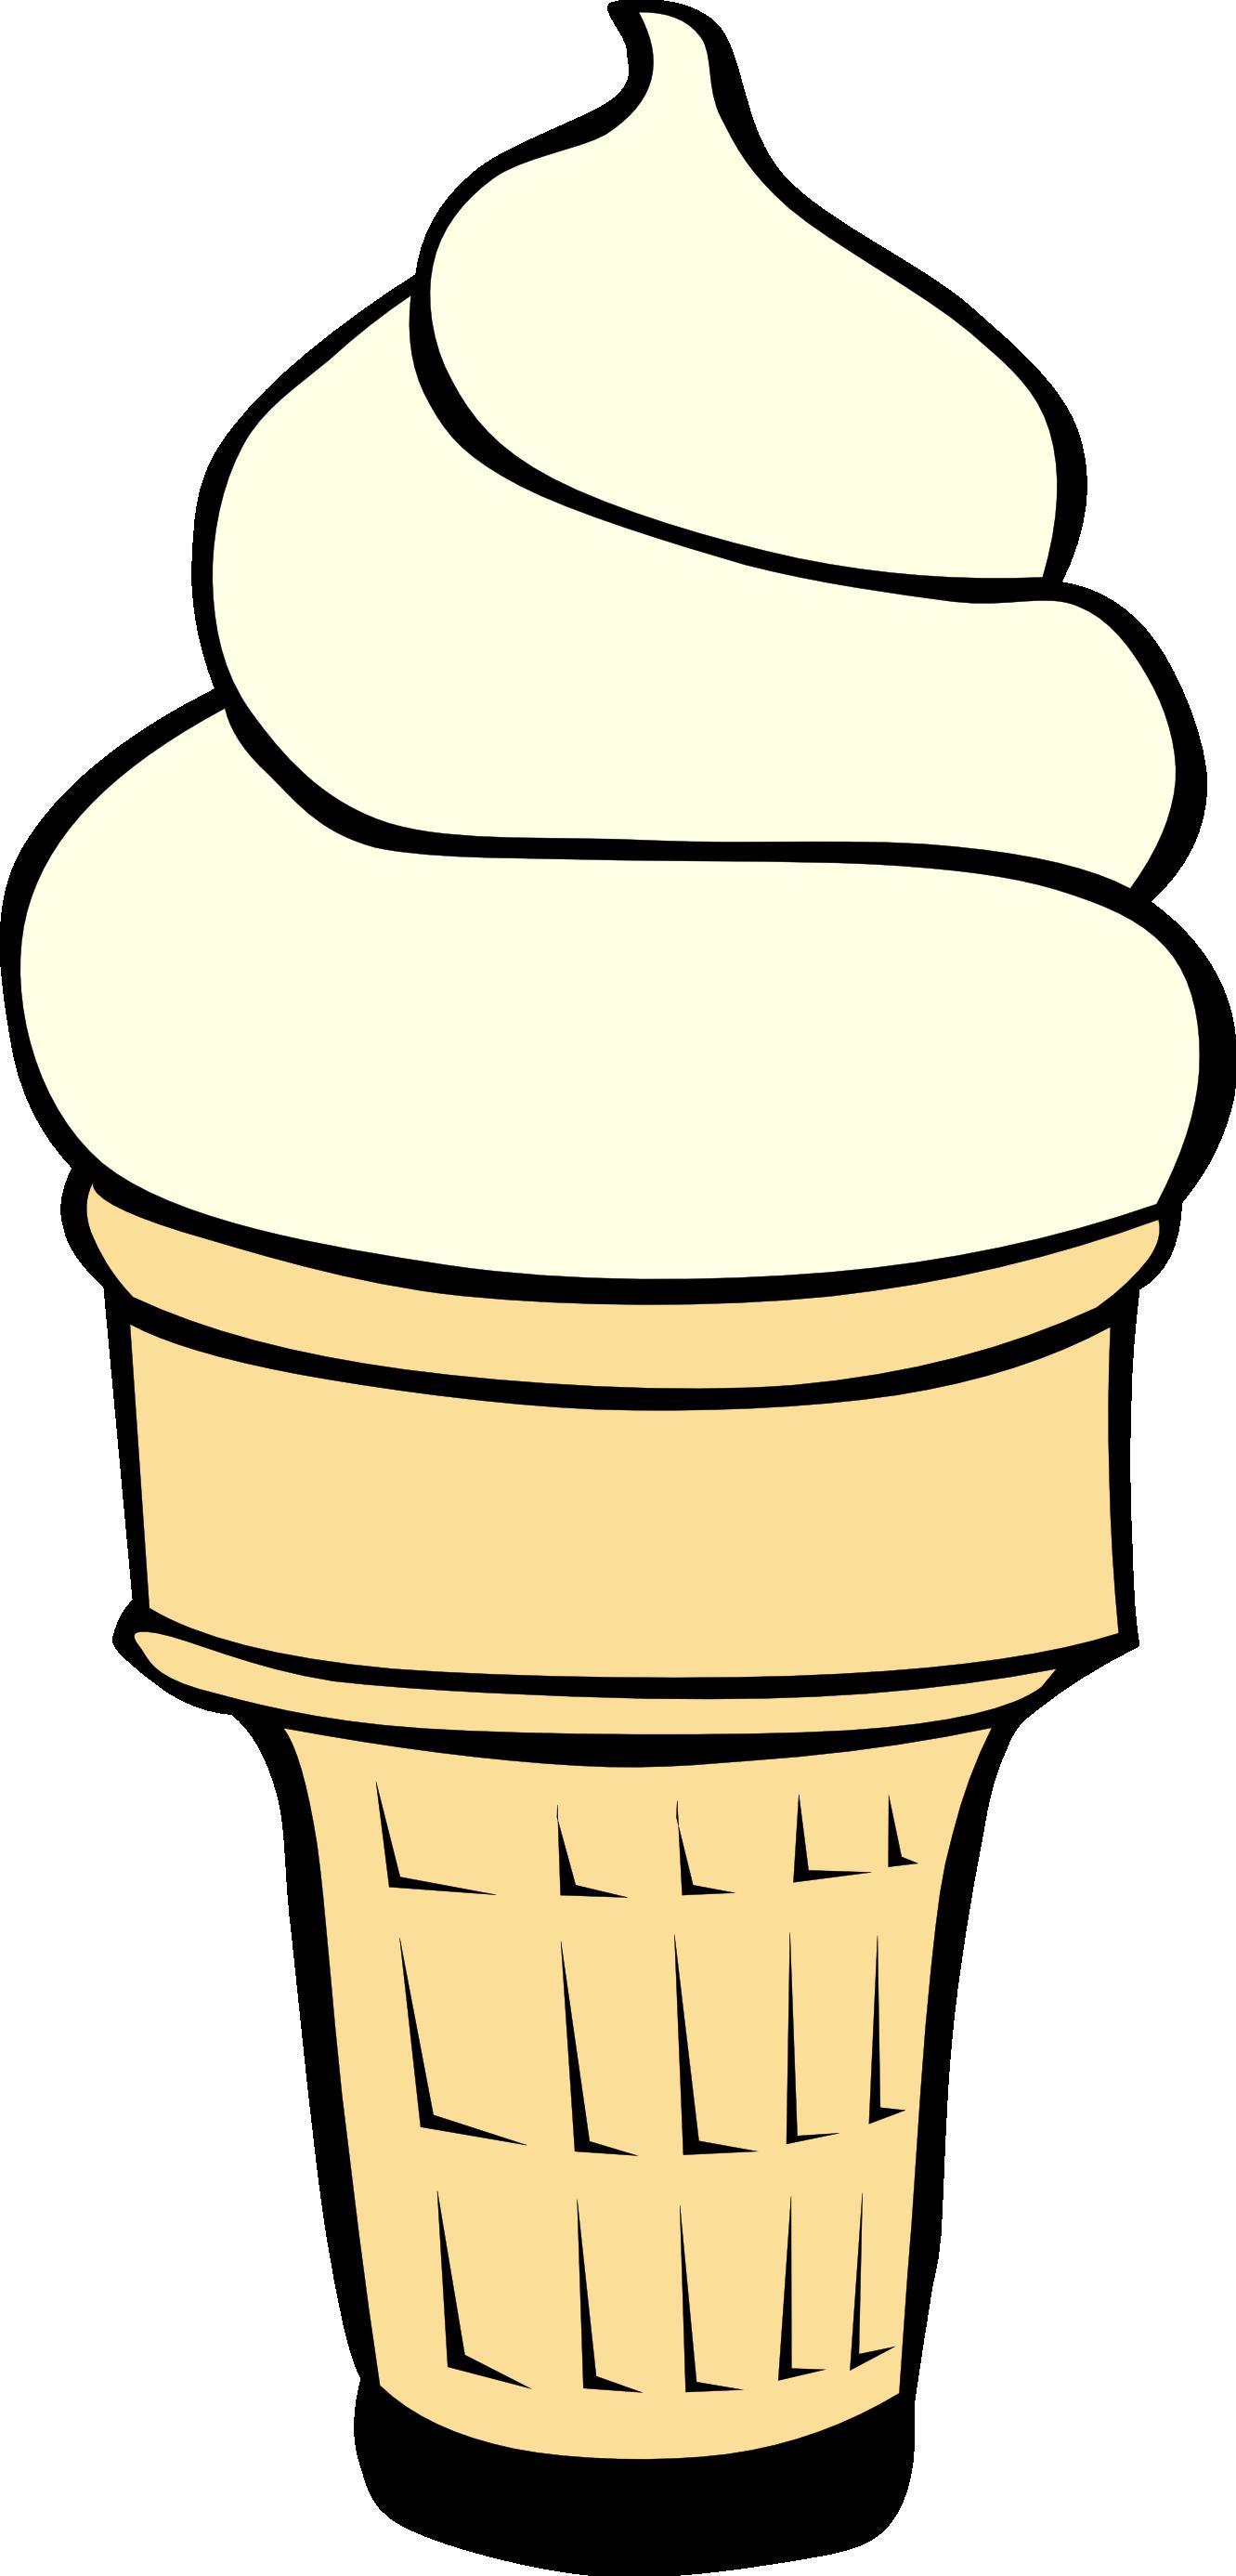 1331x2773 Ice Cream Cone Ice Creamne Clipart Clipart Kid 2